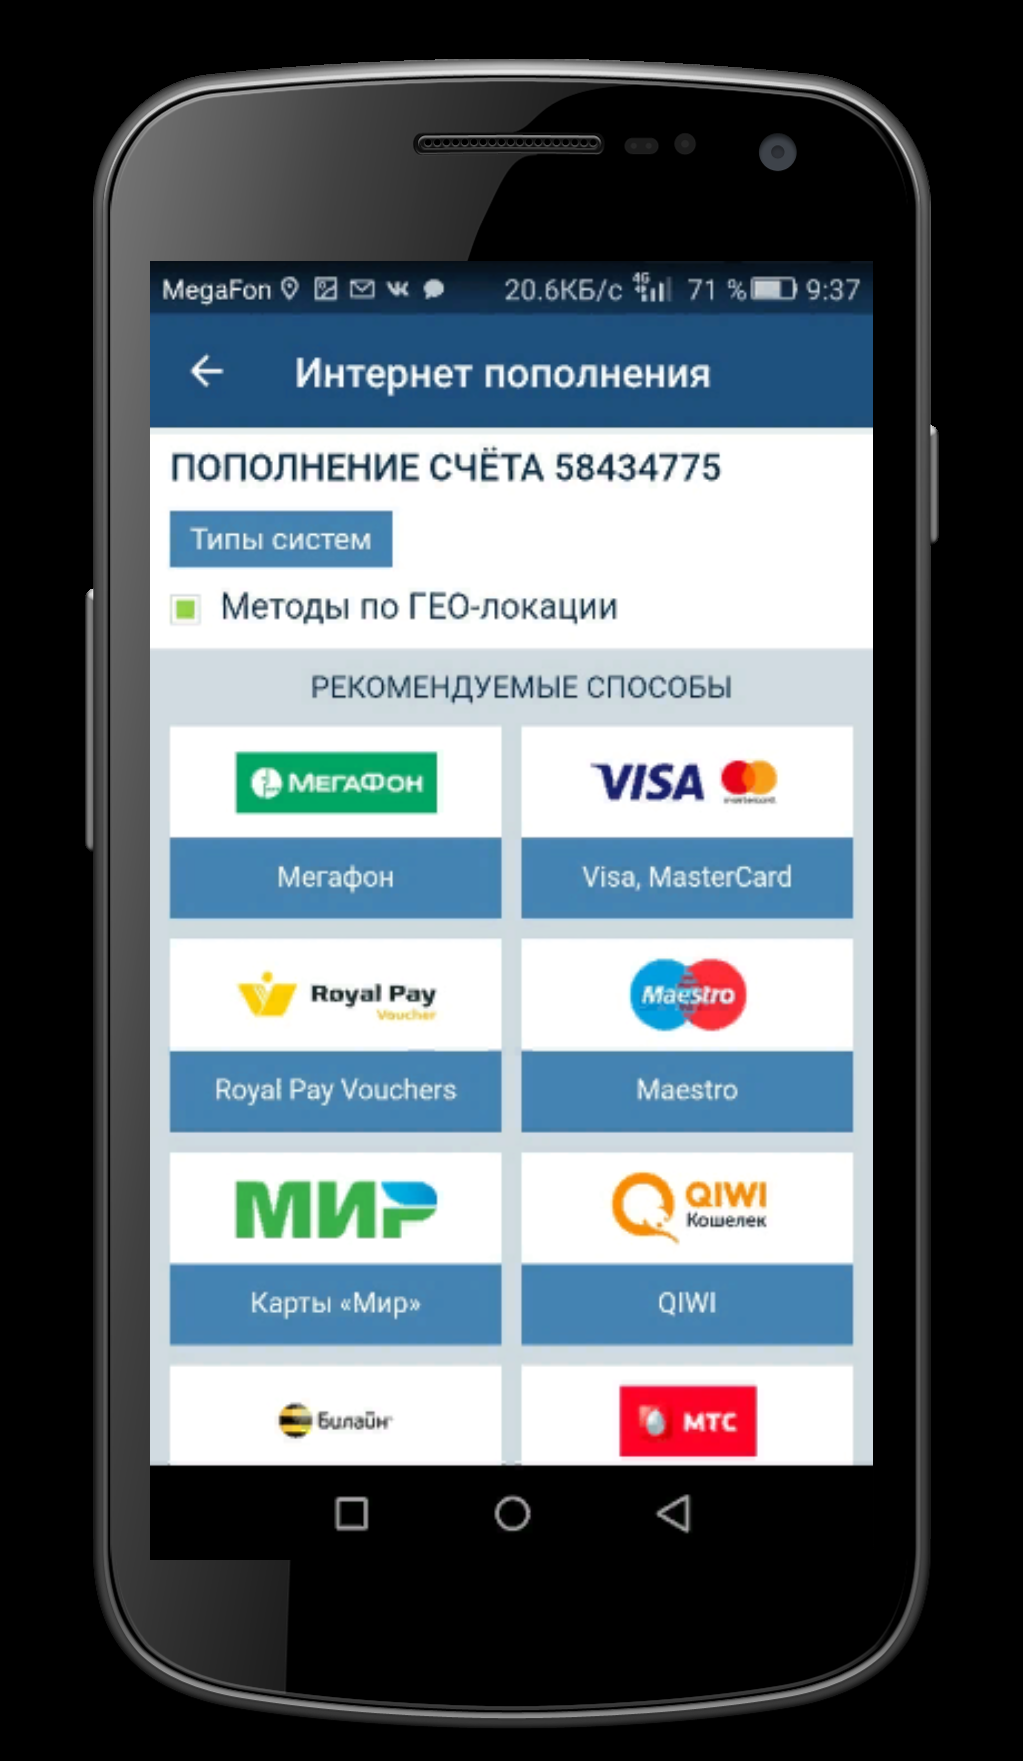 Выбор платежа 1х бет на телефоне